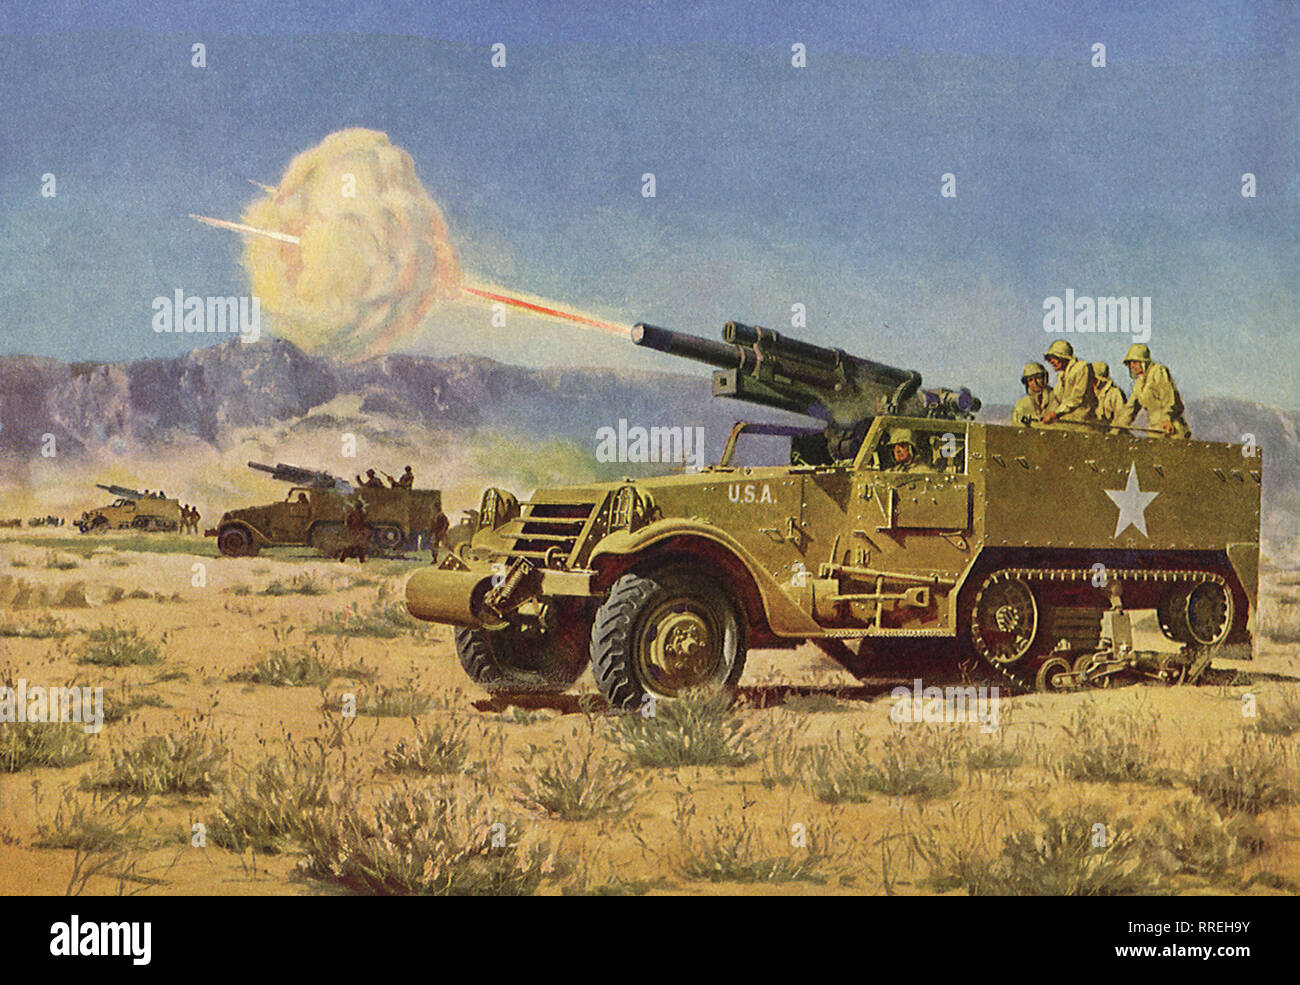 Truck tank shooting artillary gun in the field. - Stock Image